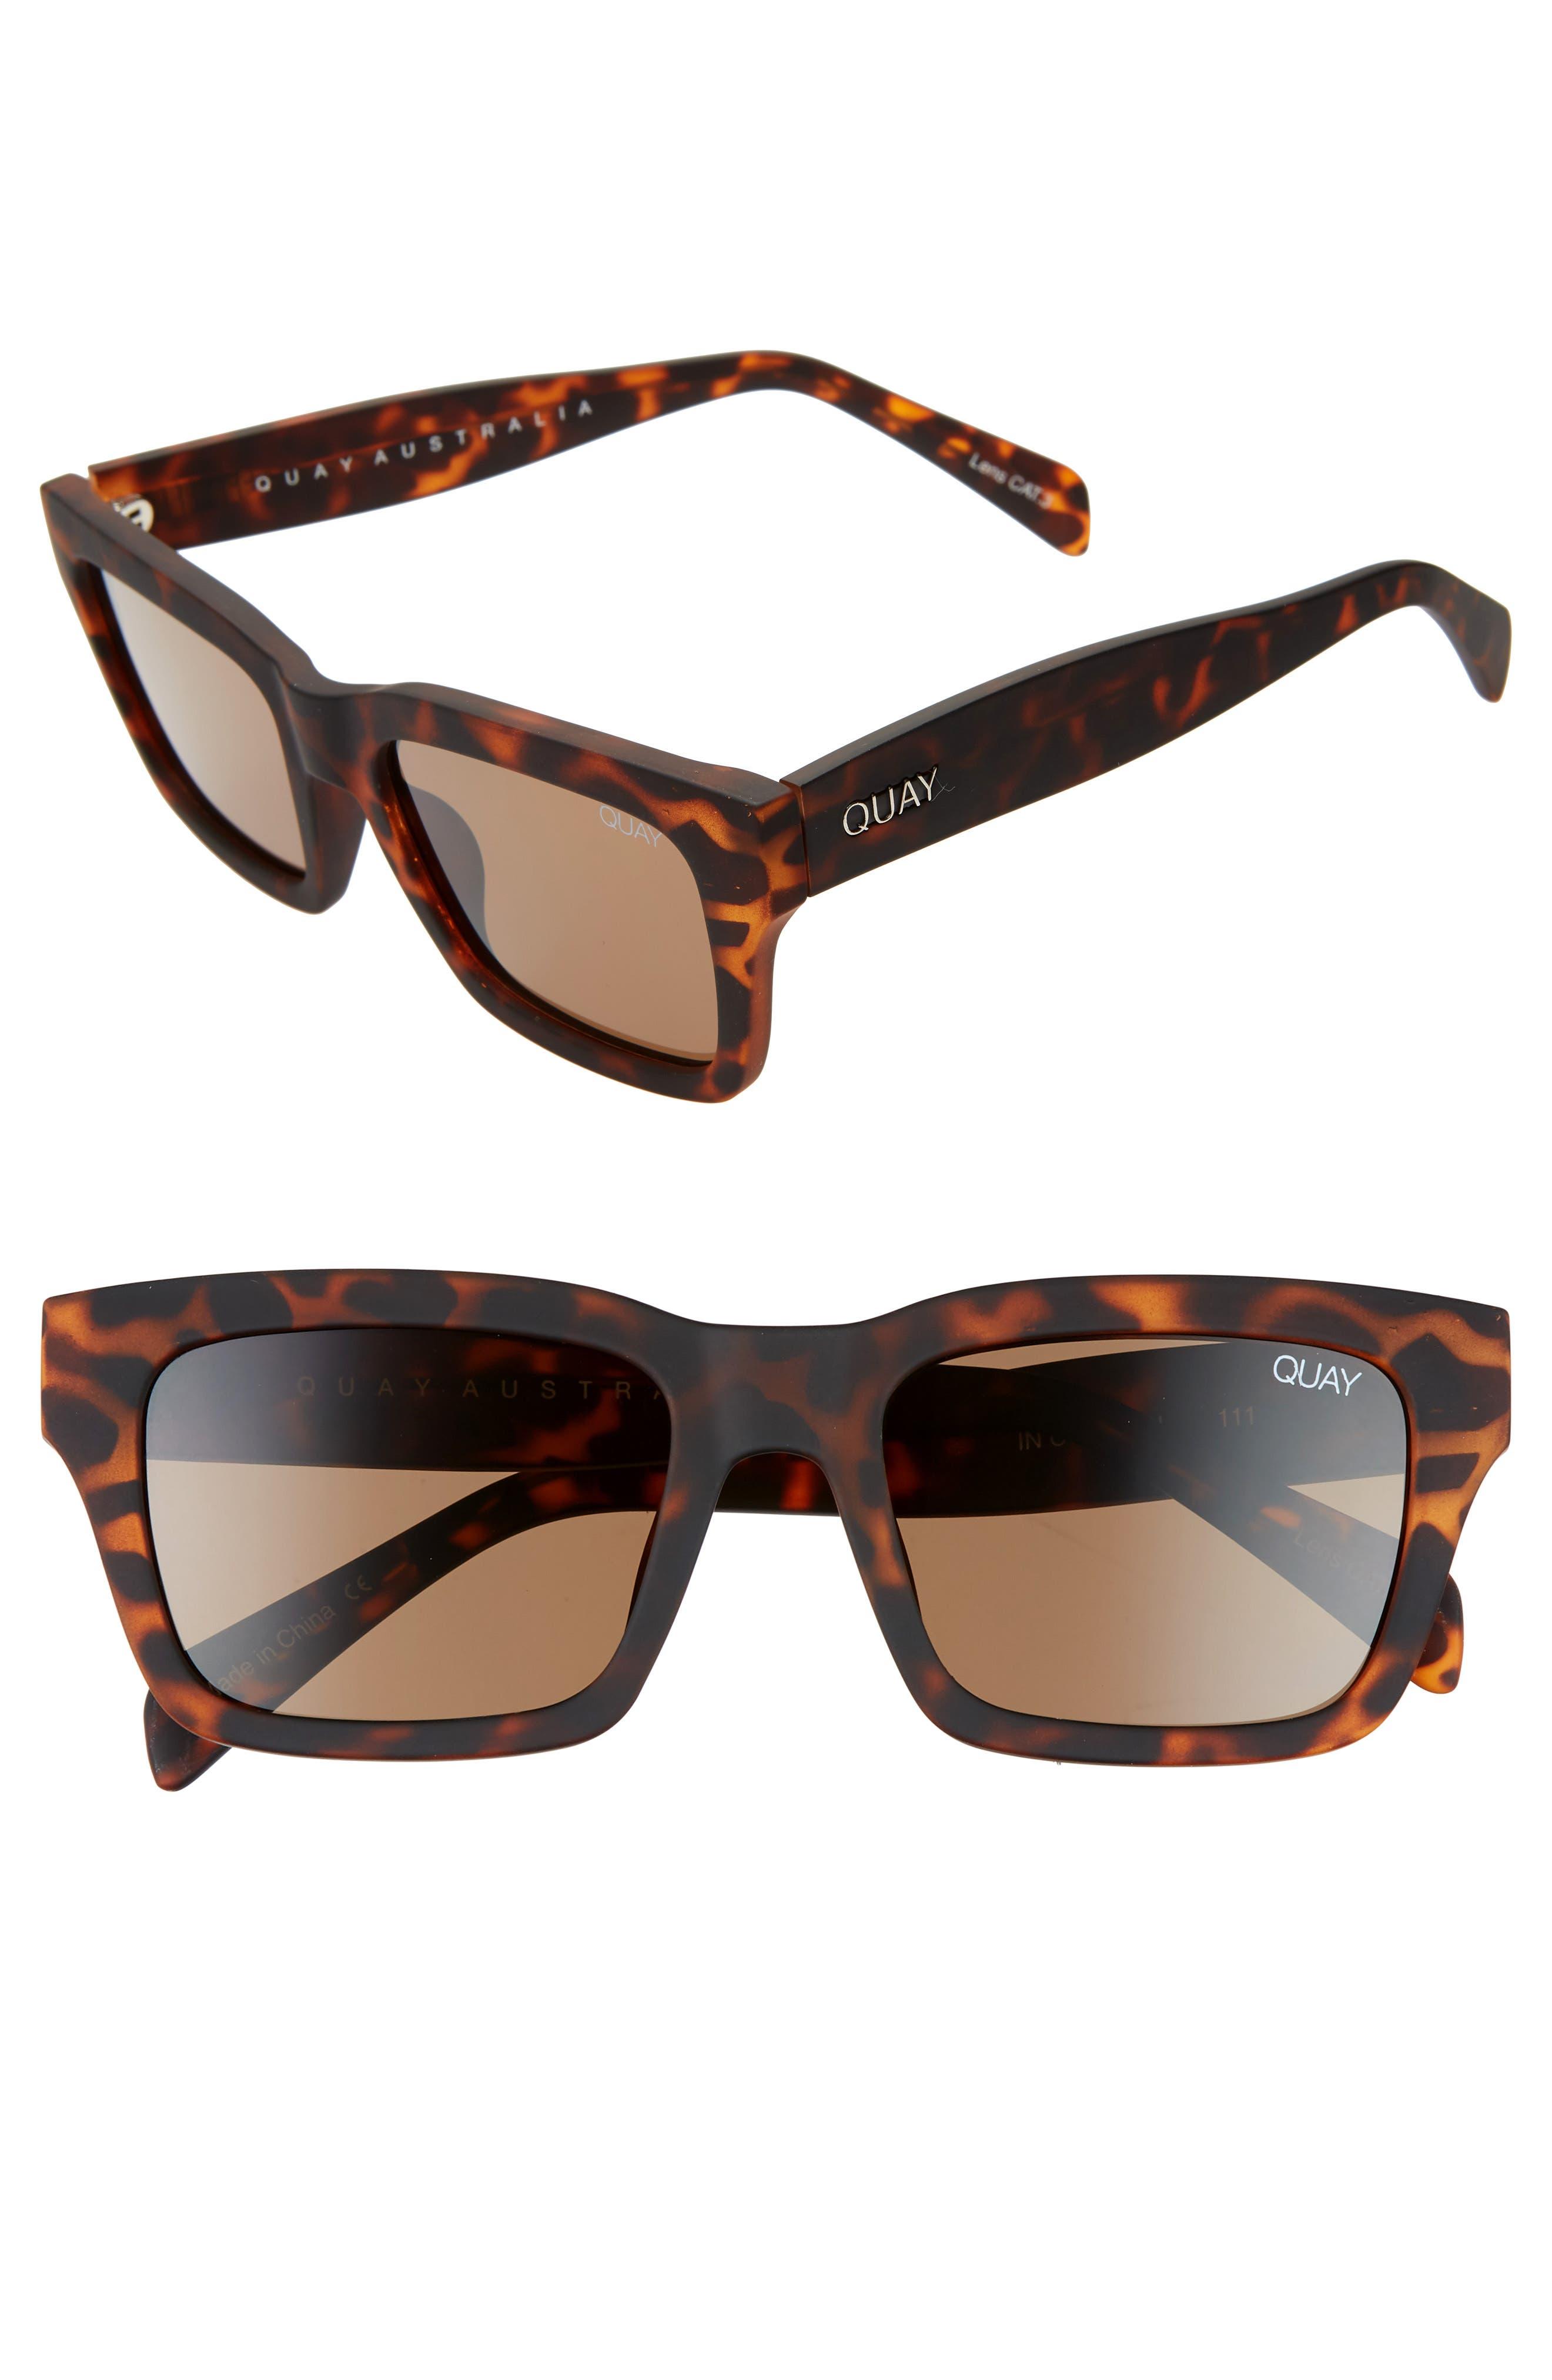 Quay Australia In Control 4m Rectangle Sunglasses - Matte Tortoise / Brown